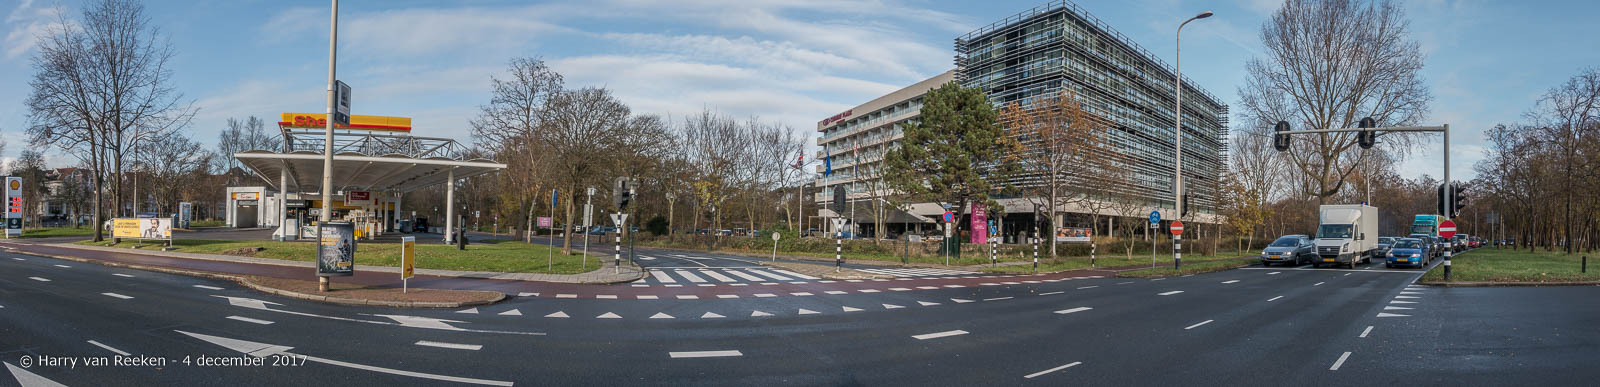 Stolkweg Van - Prof. B.M. Teldersweg - pano (1 van 1)